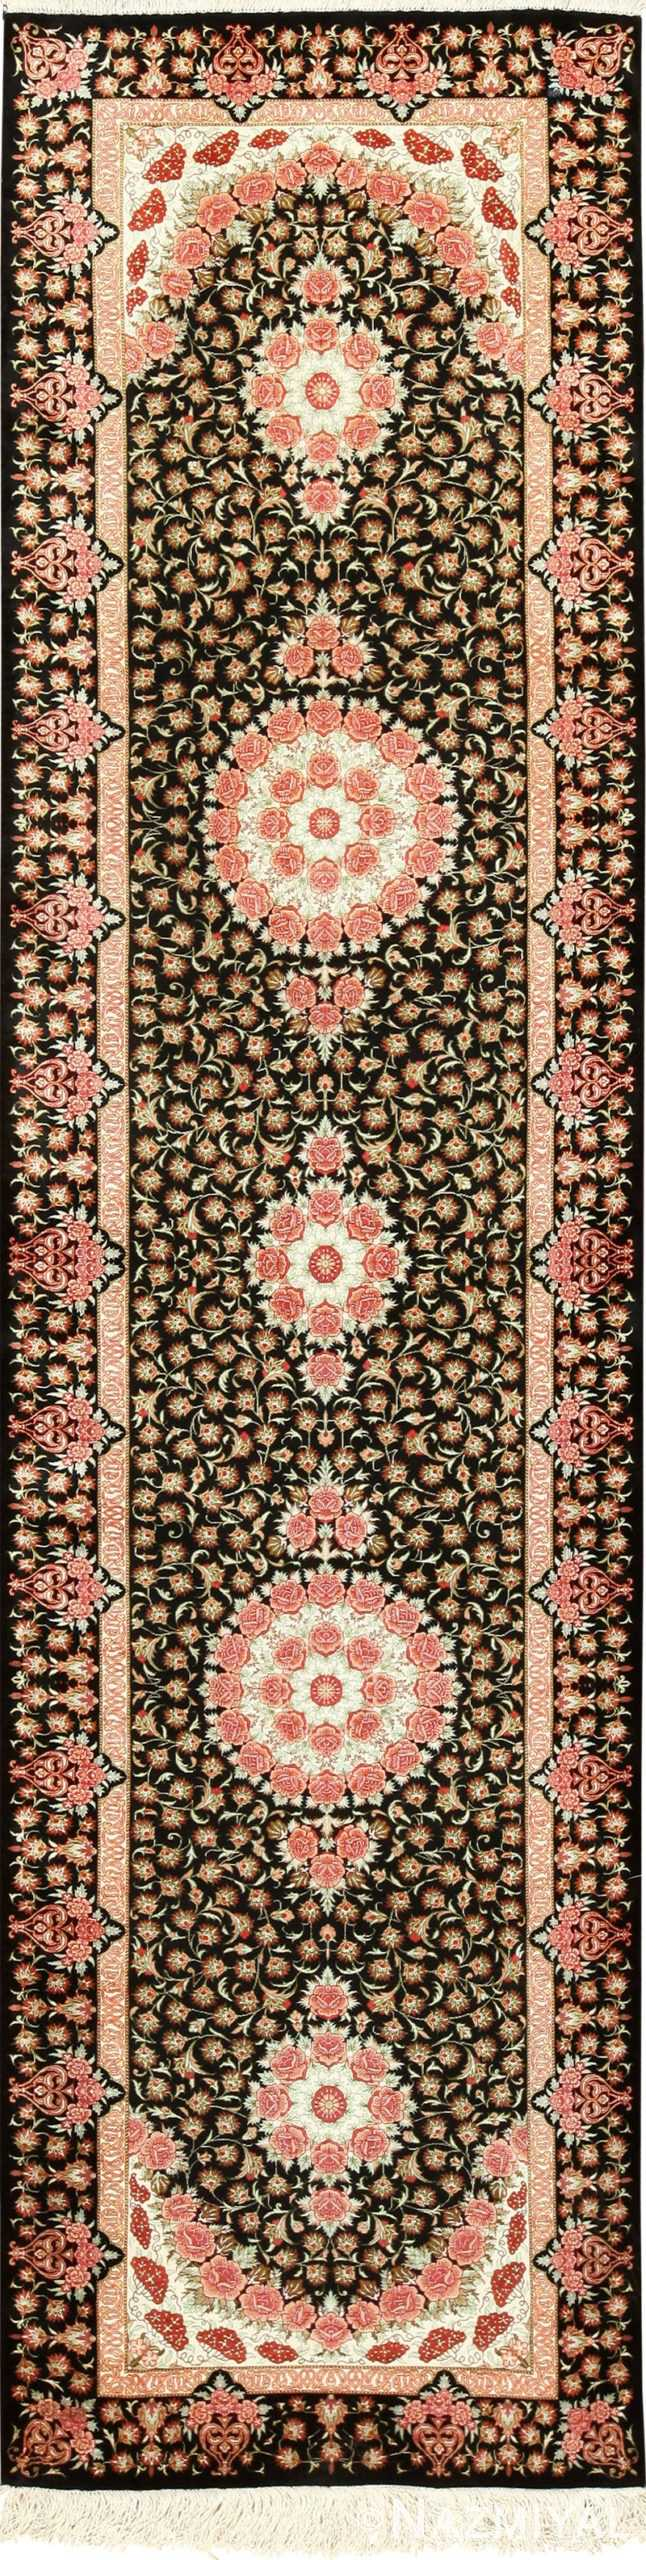 black bakground silk modern qum persian runner 49404 Namziyal